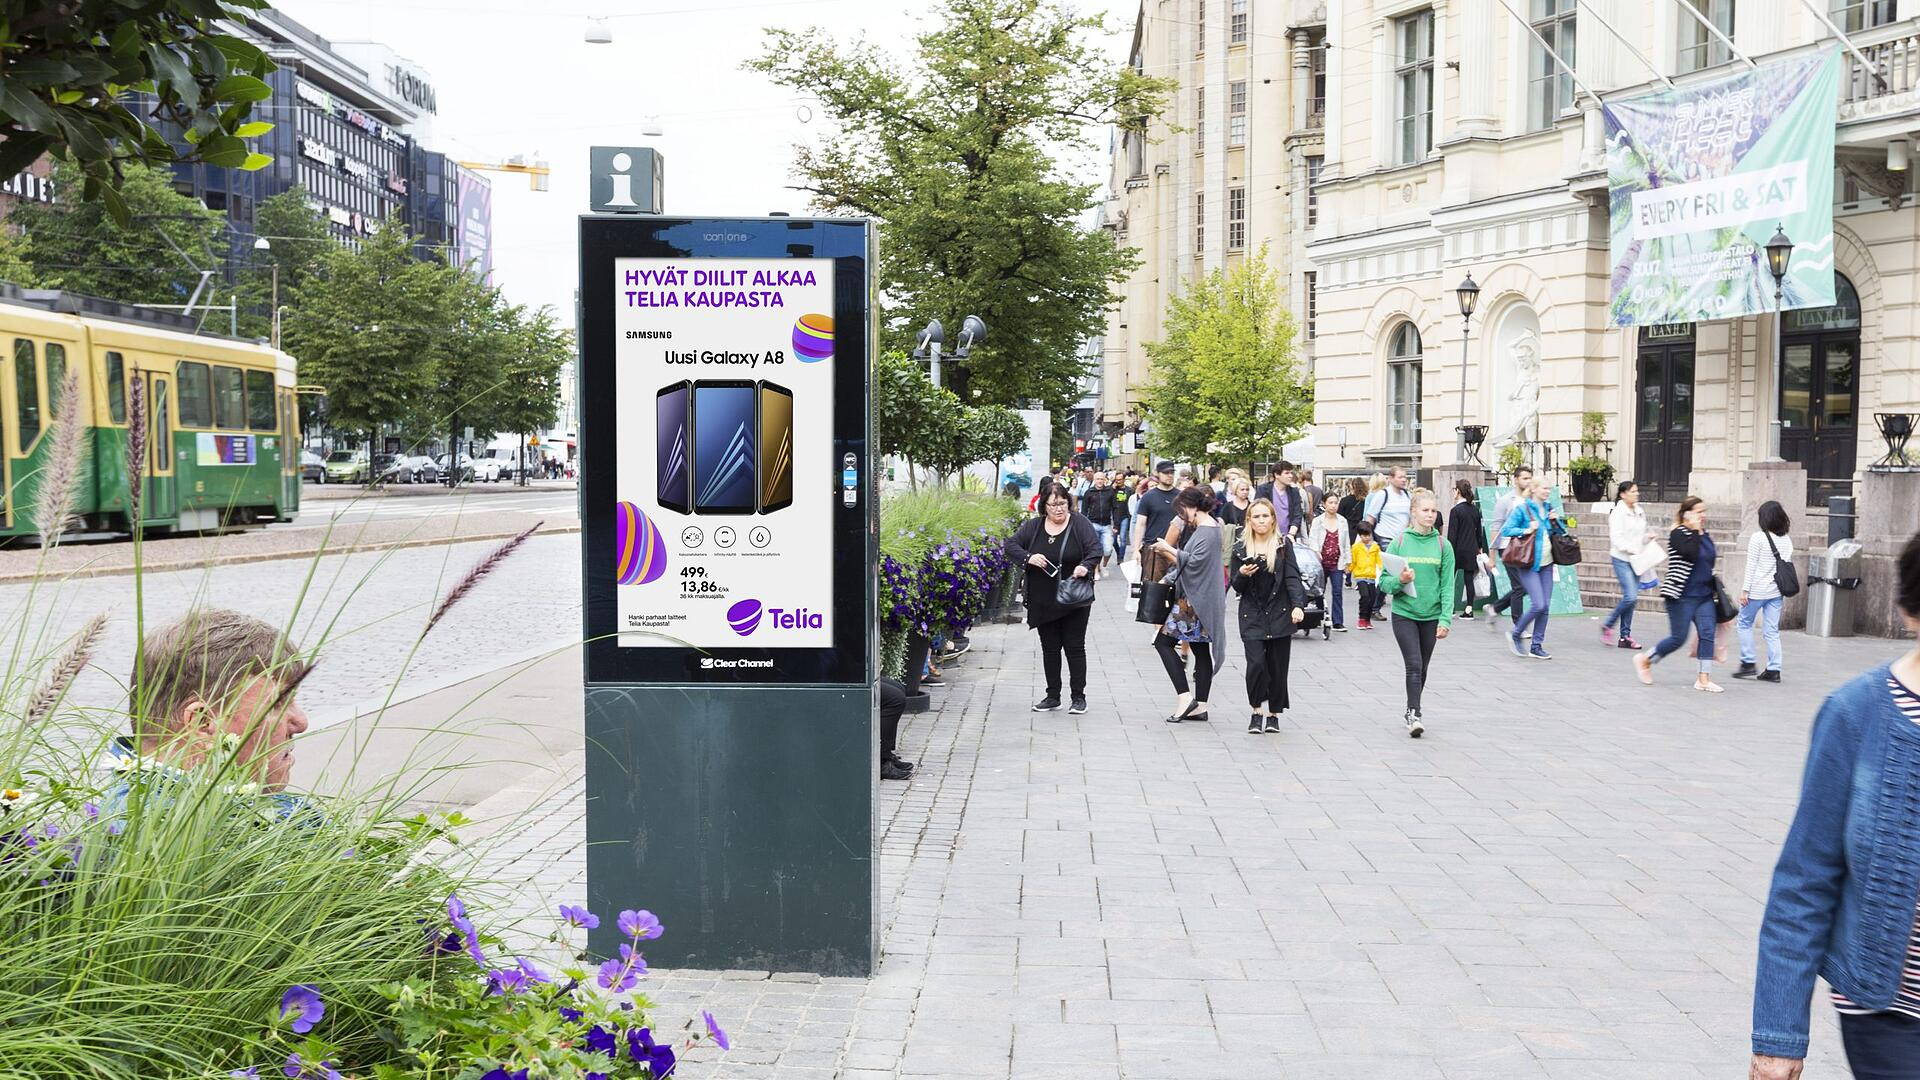 Downtown digital | Tuotantotiedot